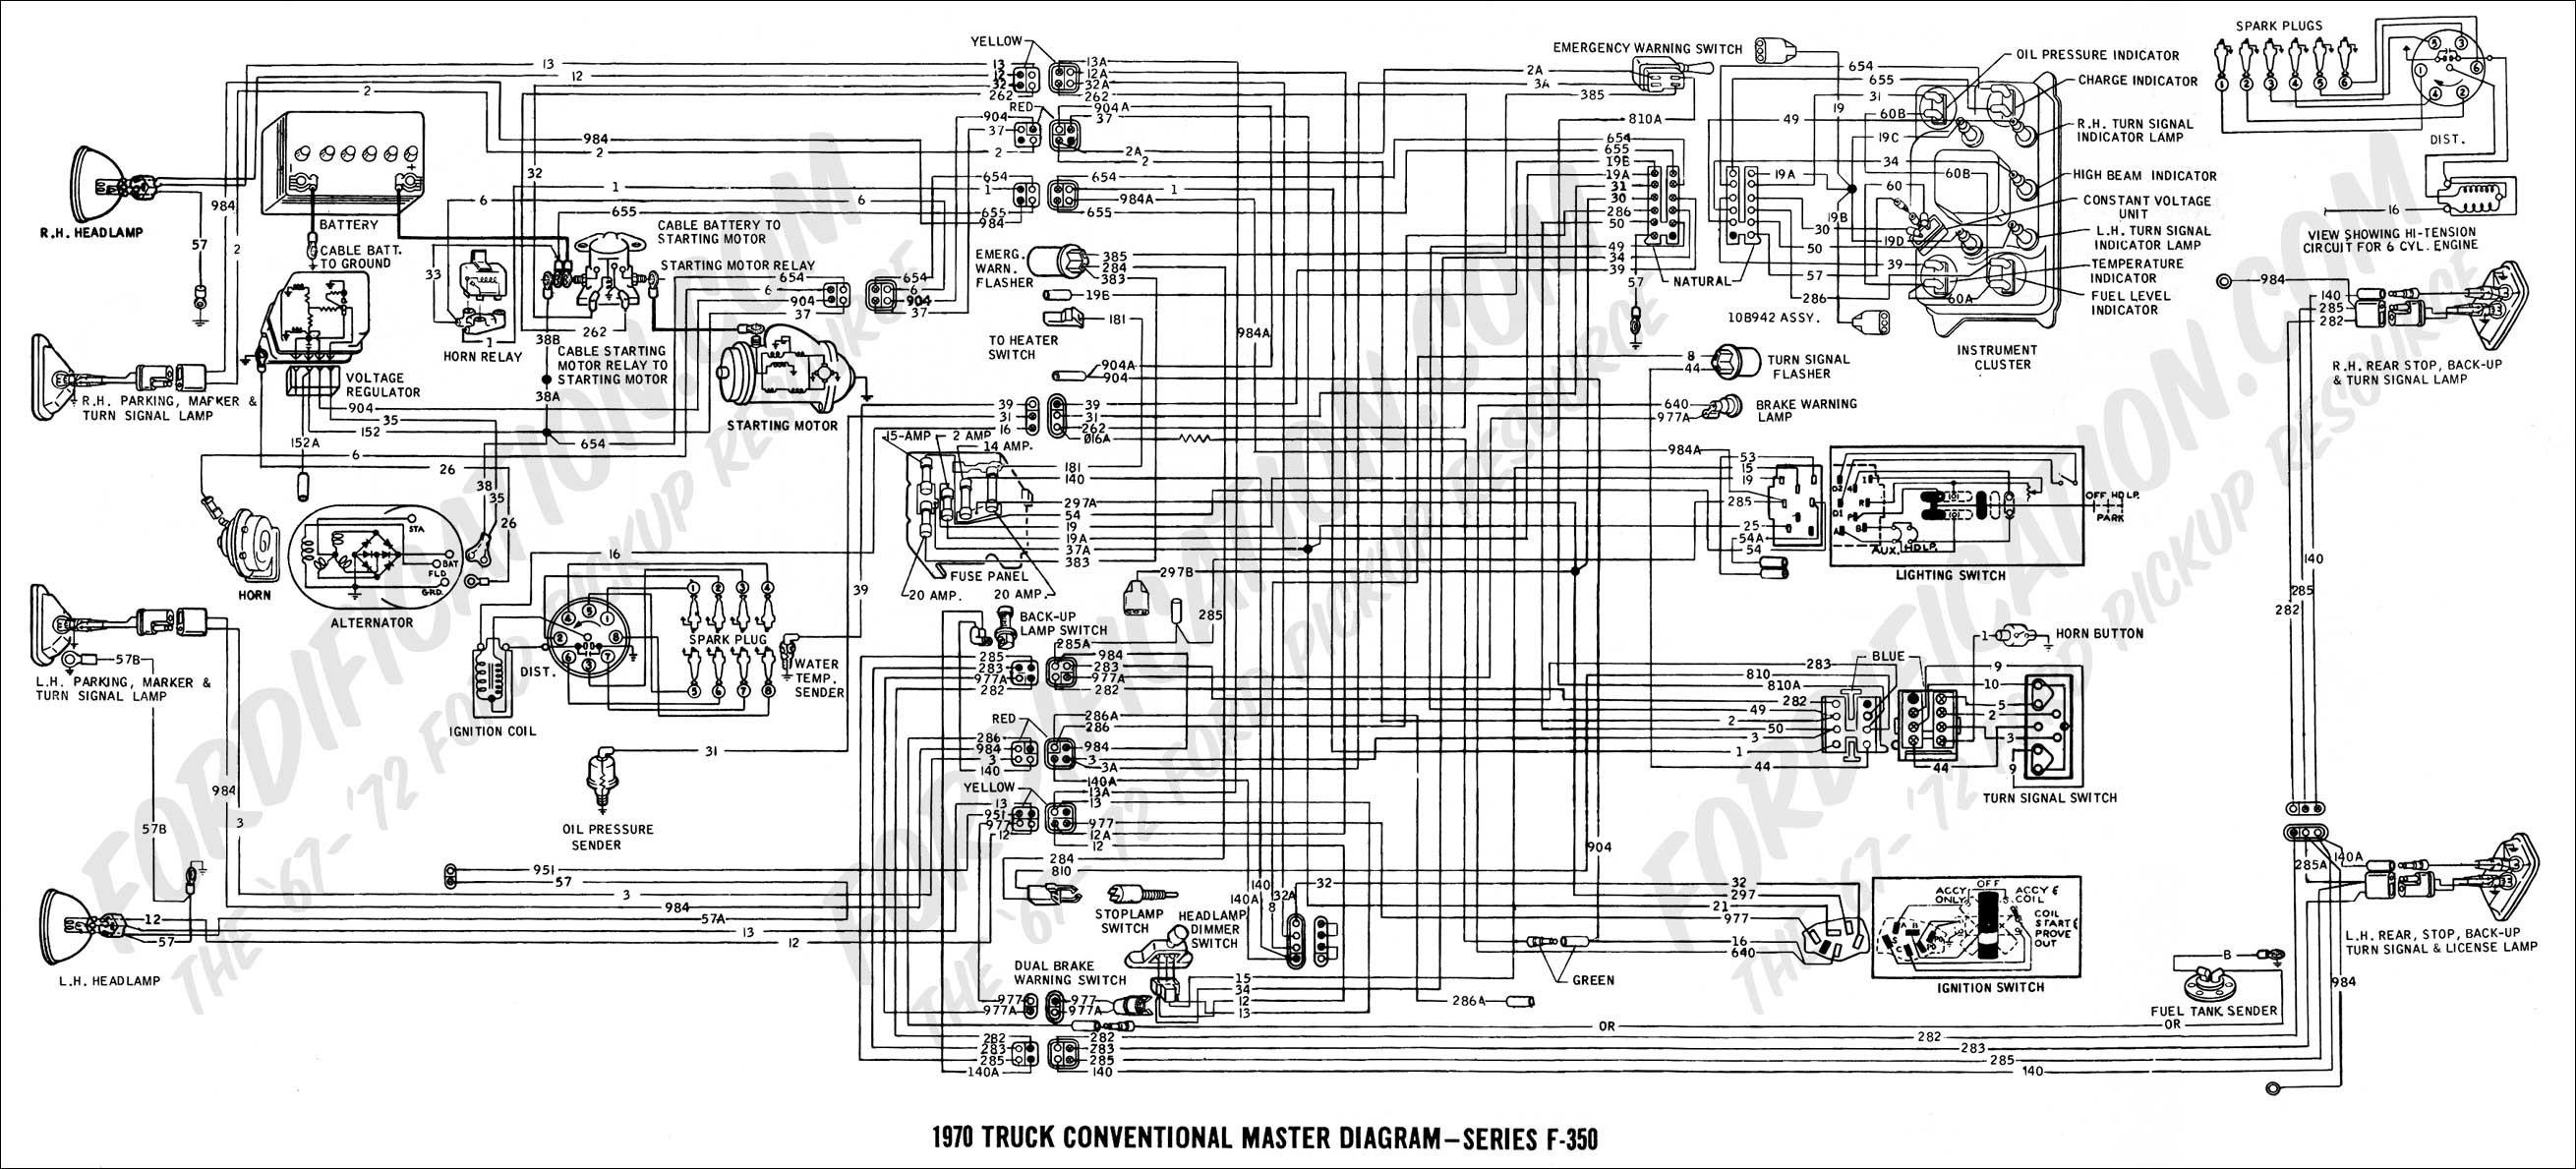 2001 ford Ranger Engine Diagram ford Ranger Parts Diagram